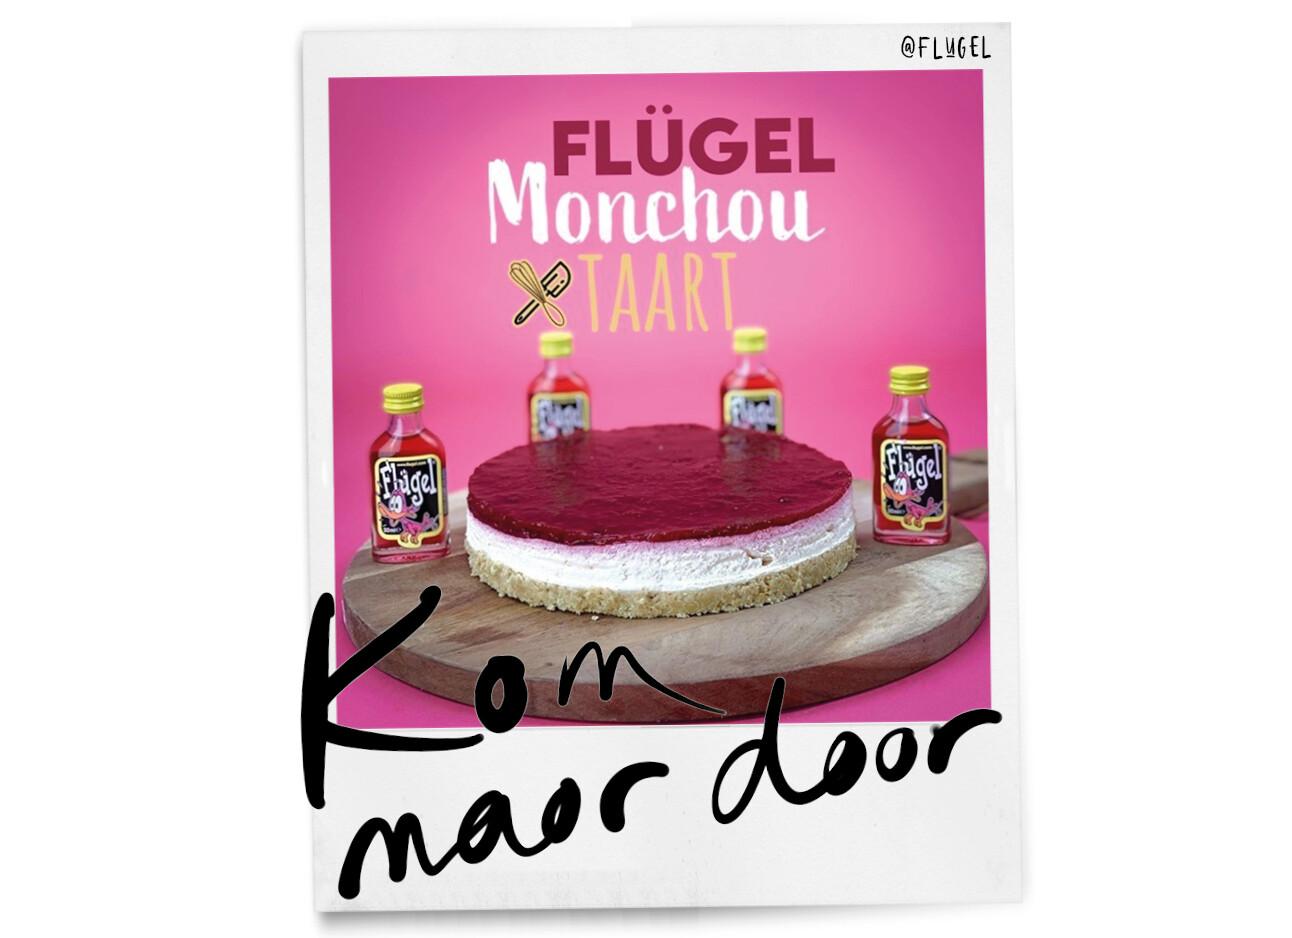 flugel monchou taart